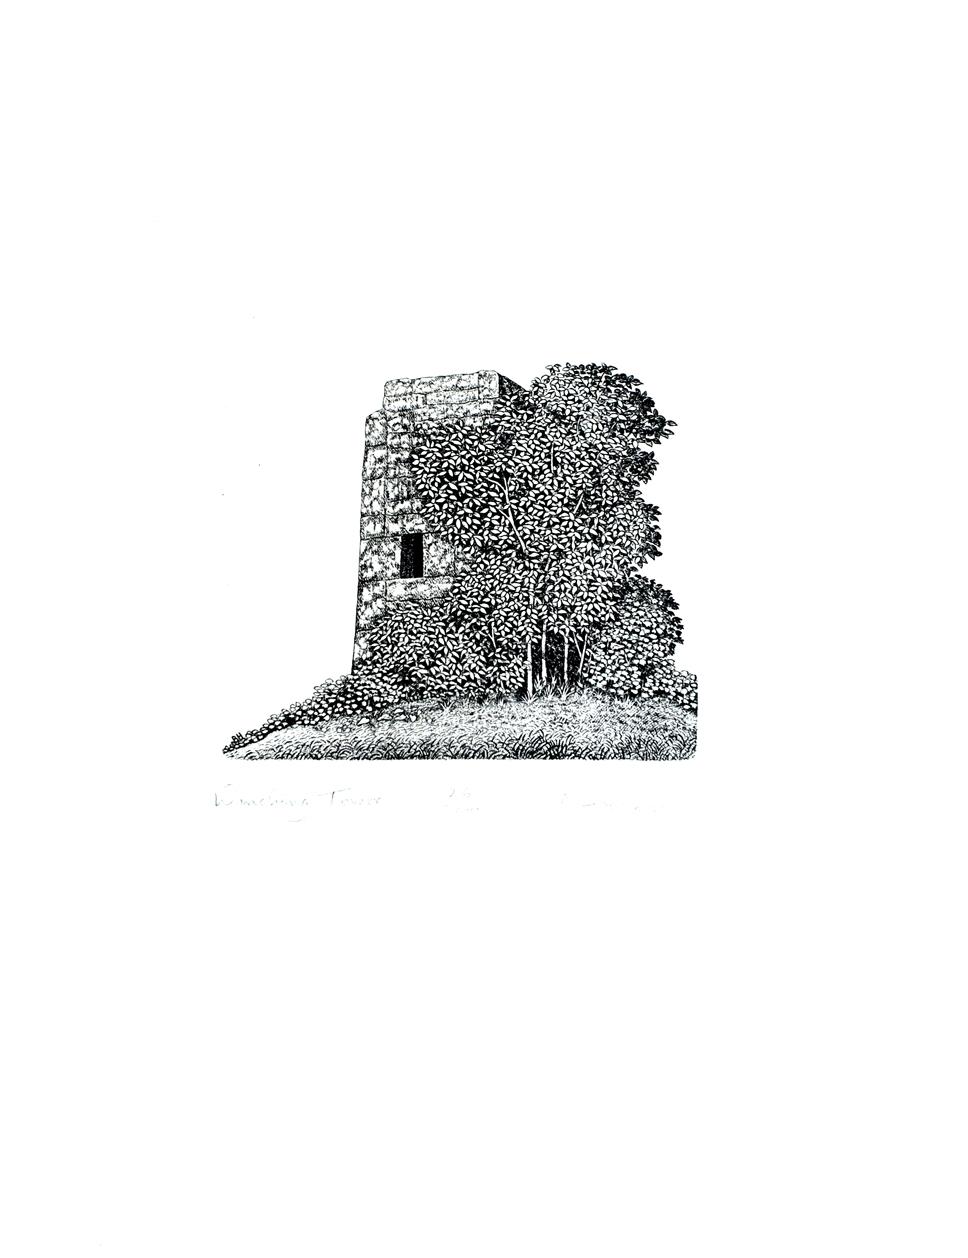 Winching Tower